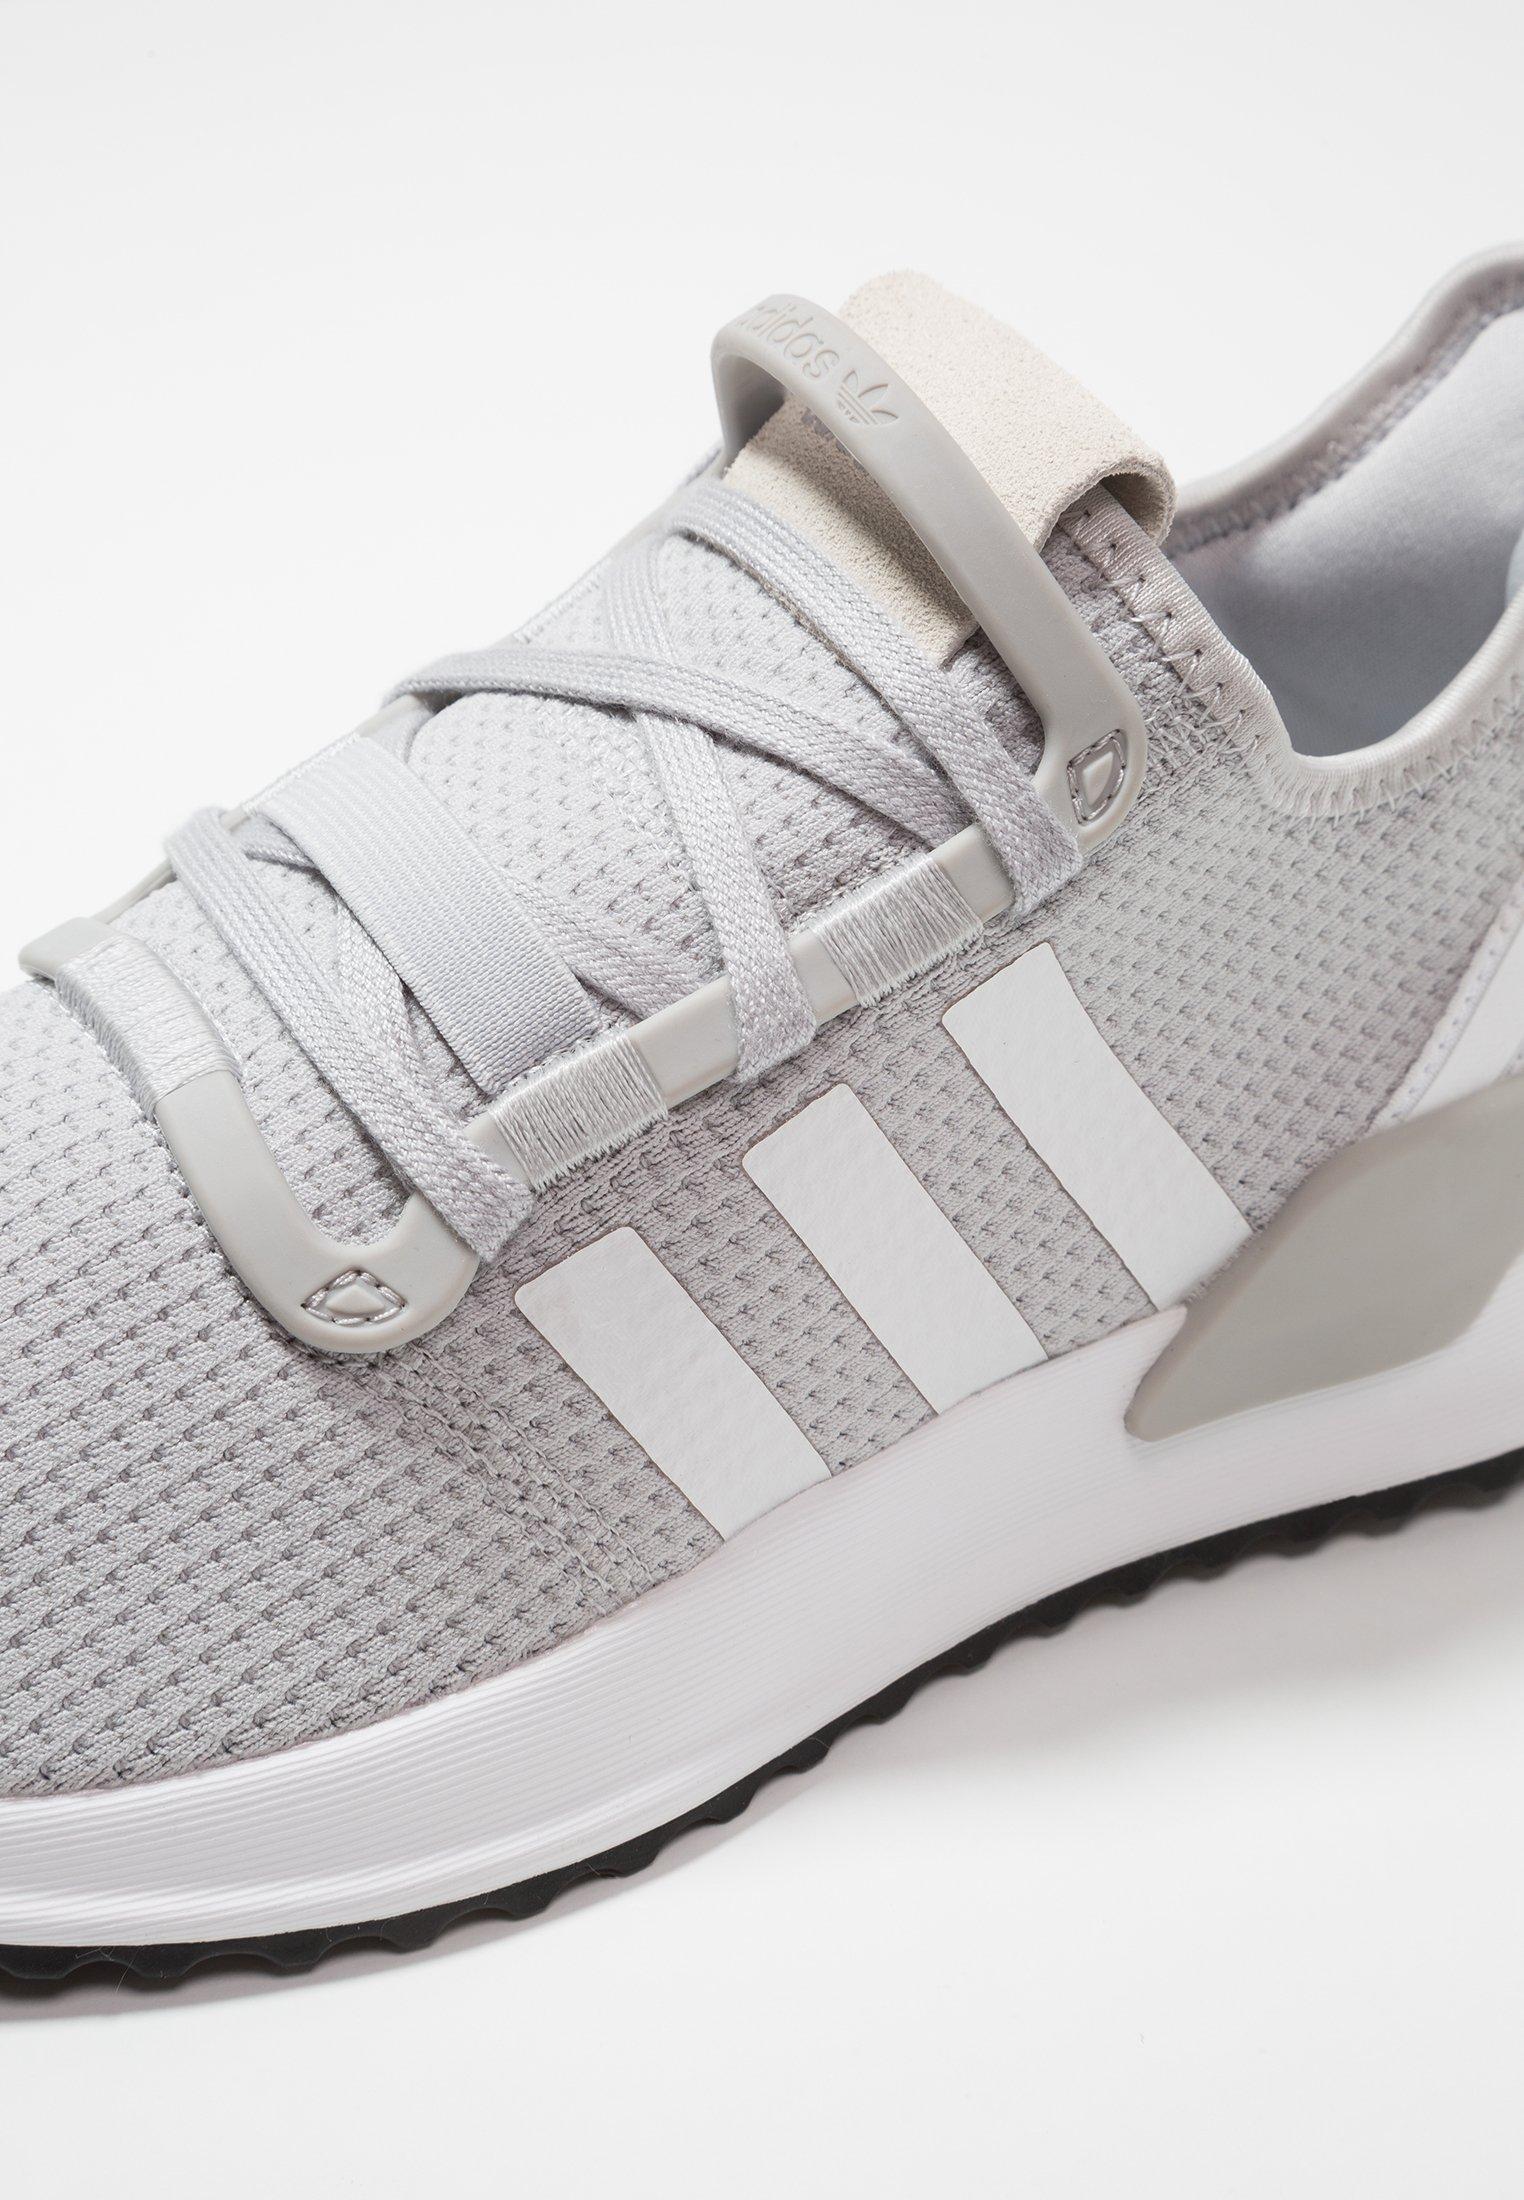 core RunBaskets Path Light Grey White Solid footwear Adidas Basses Black Originals PkZuXTOi